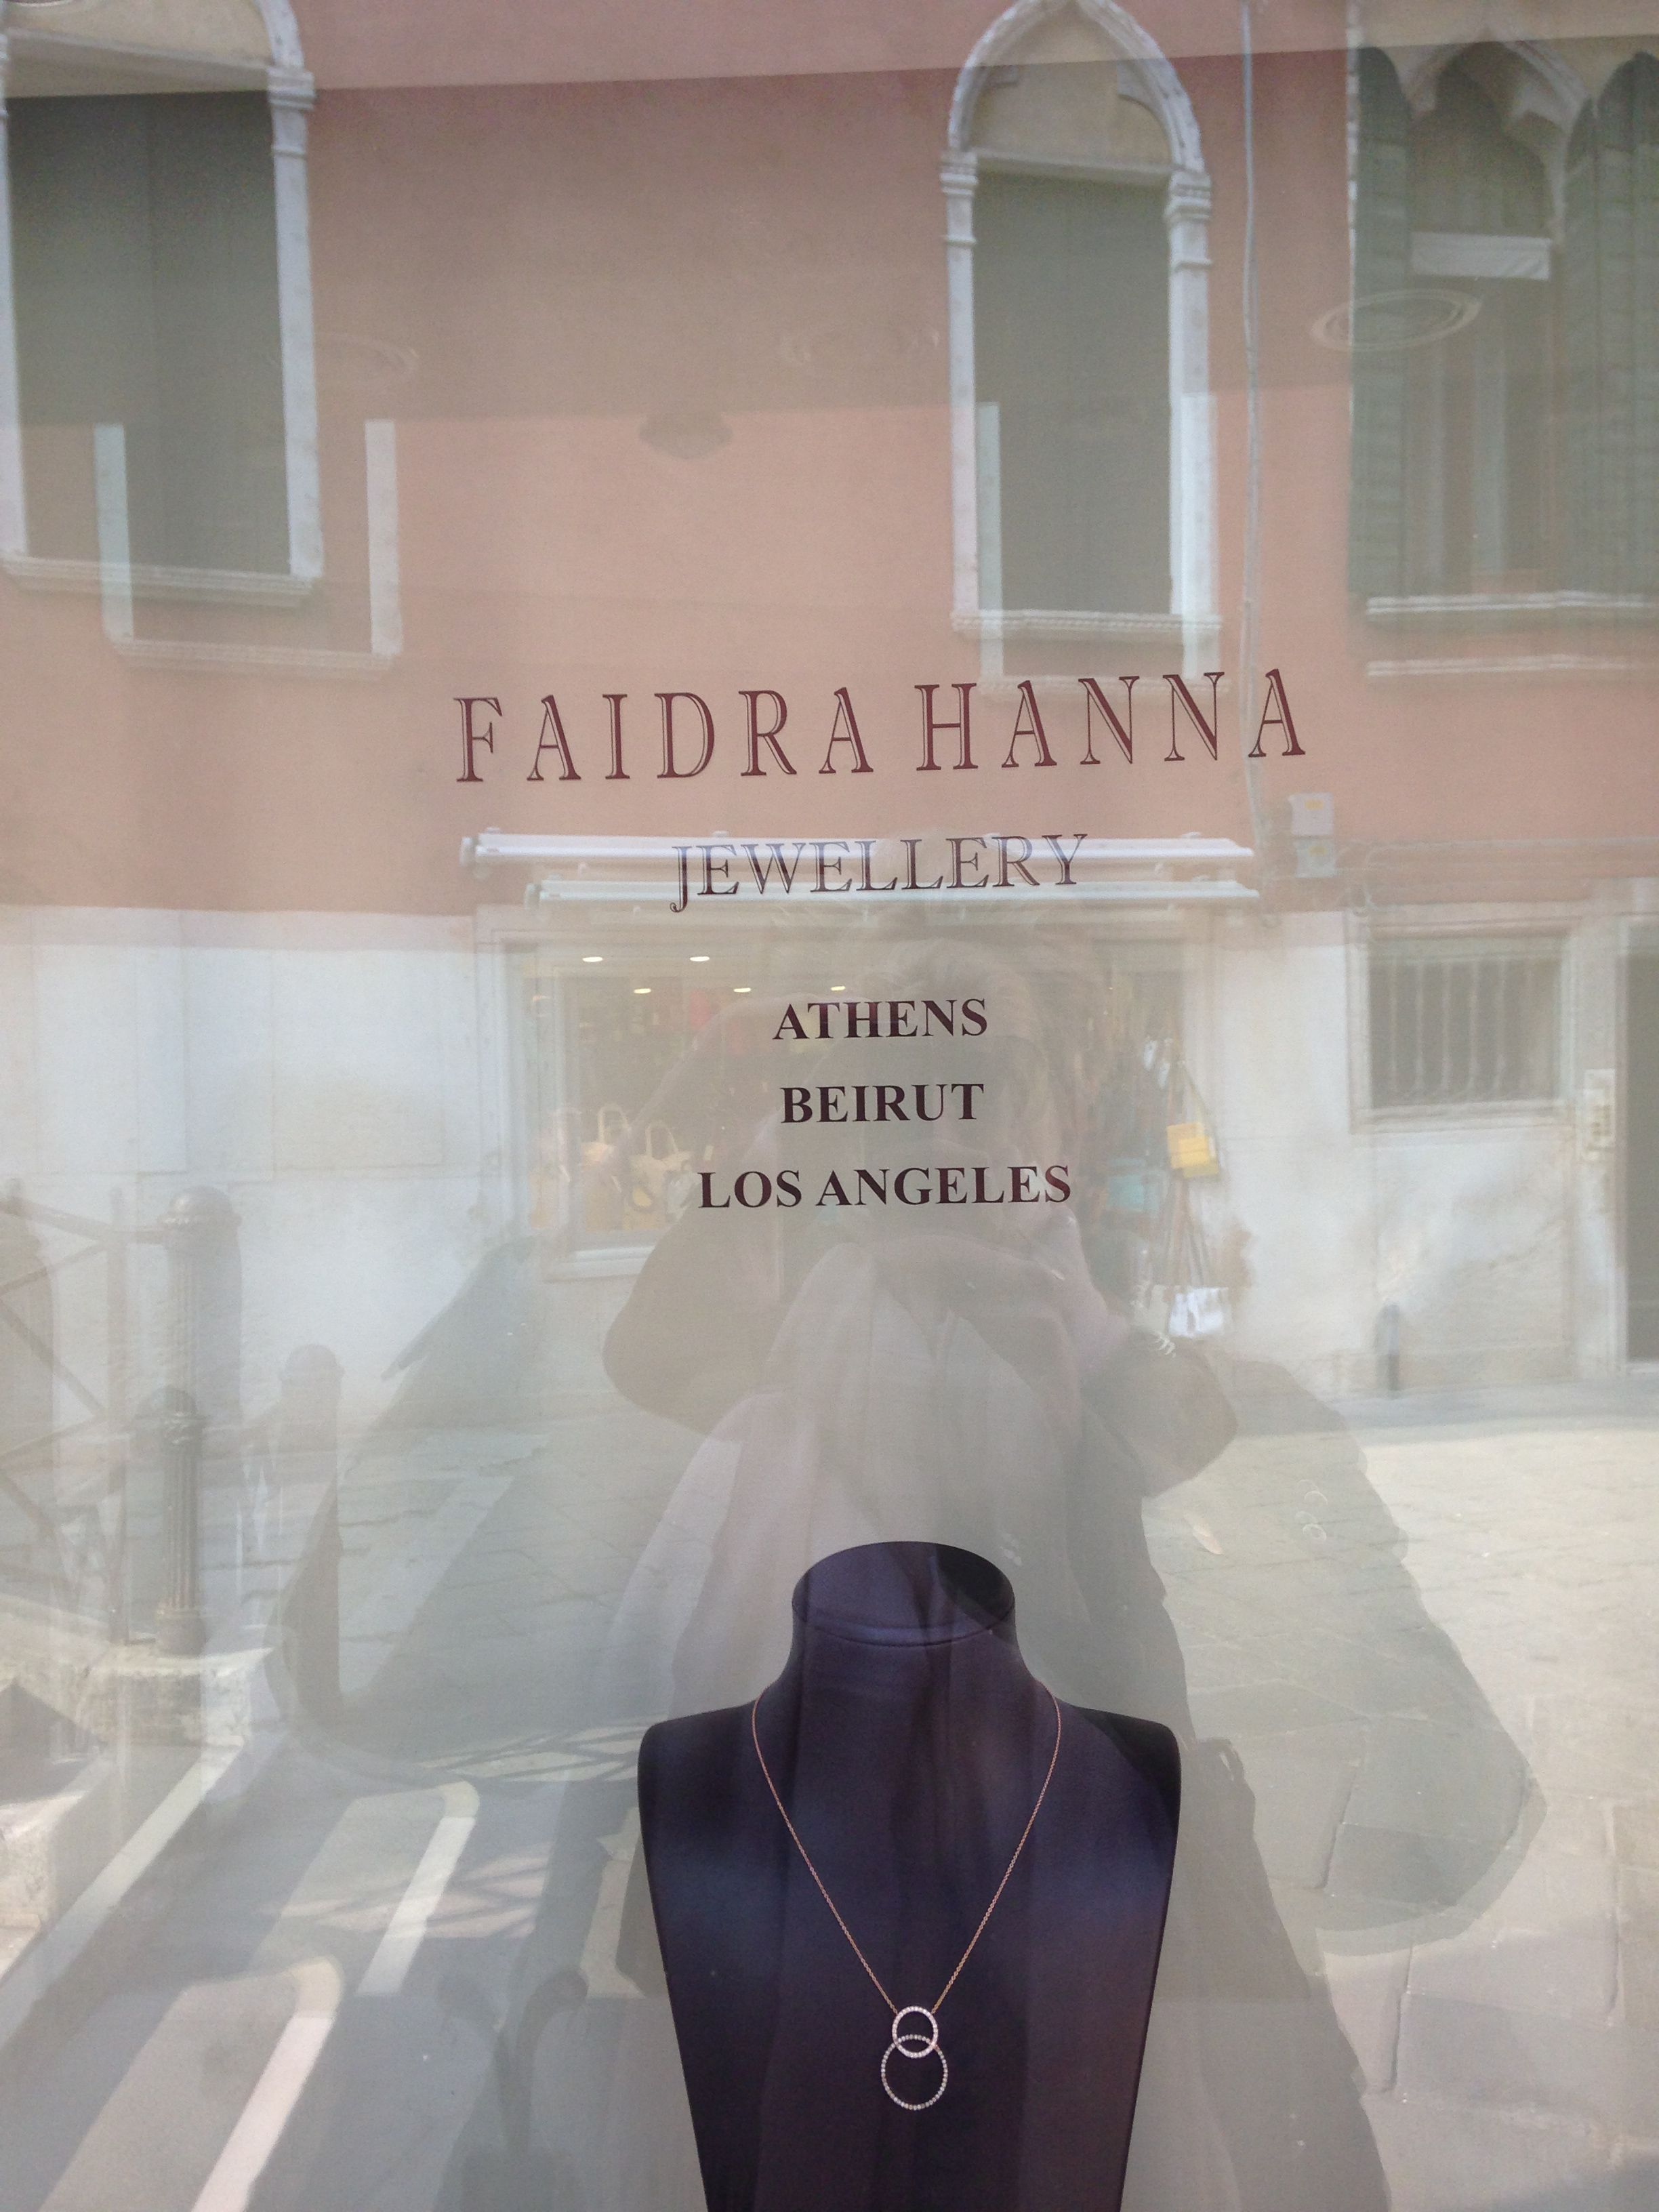 Faidra Hanna Jewellery shop in Venice